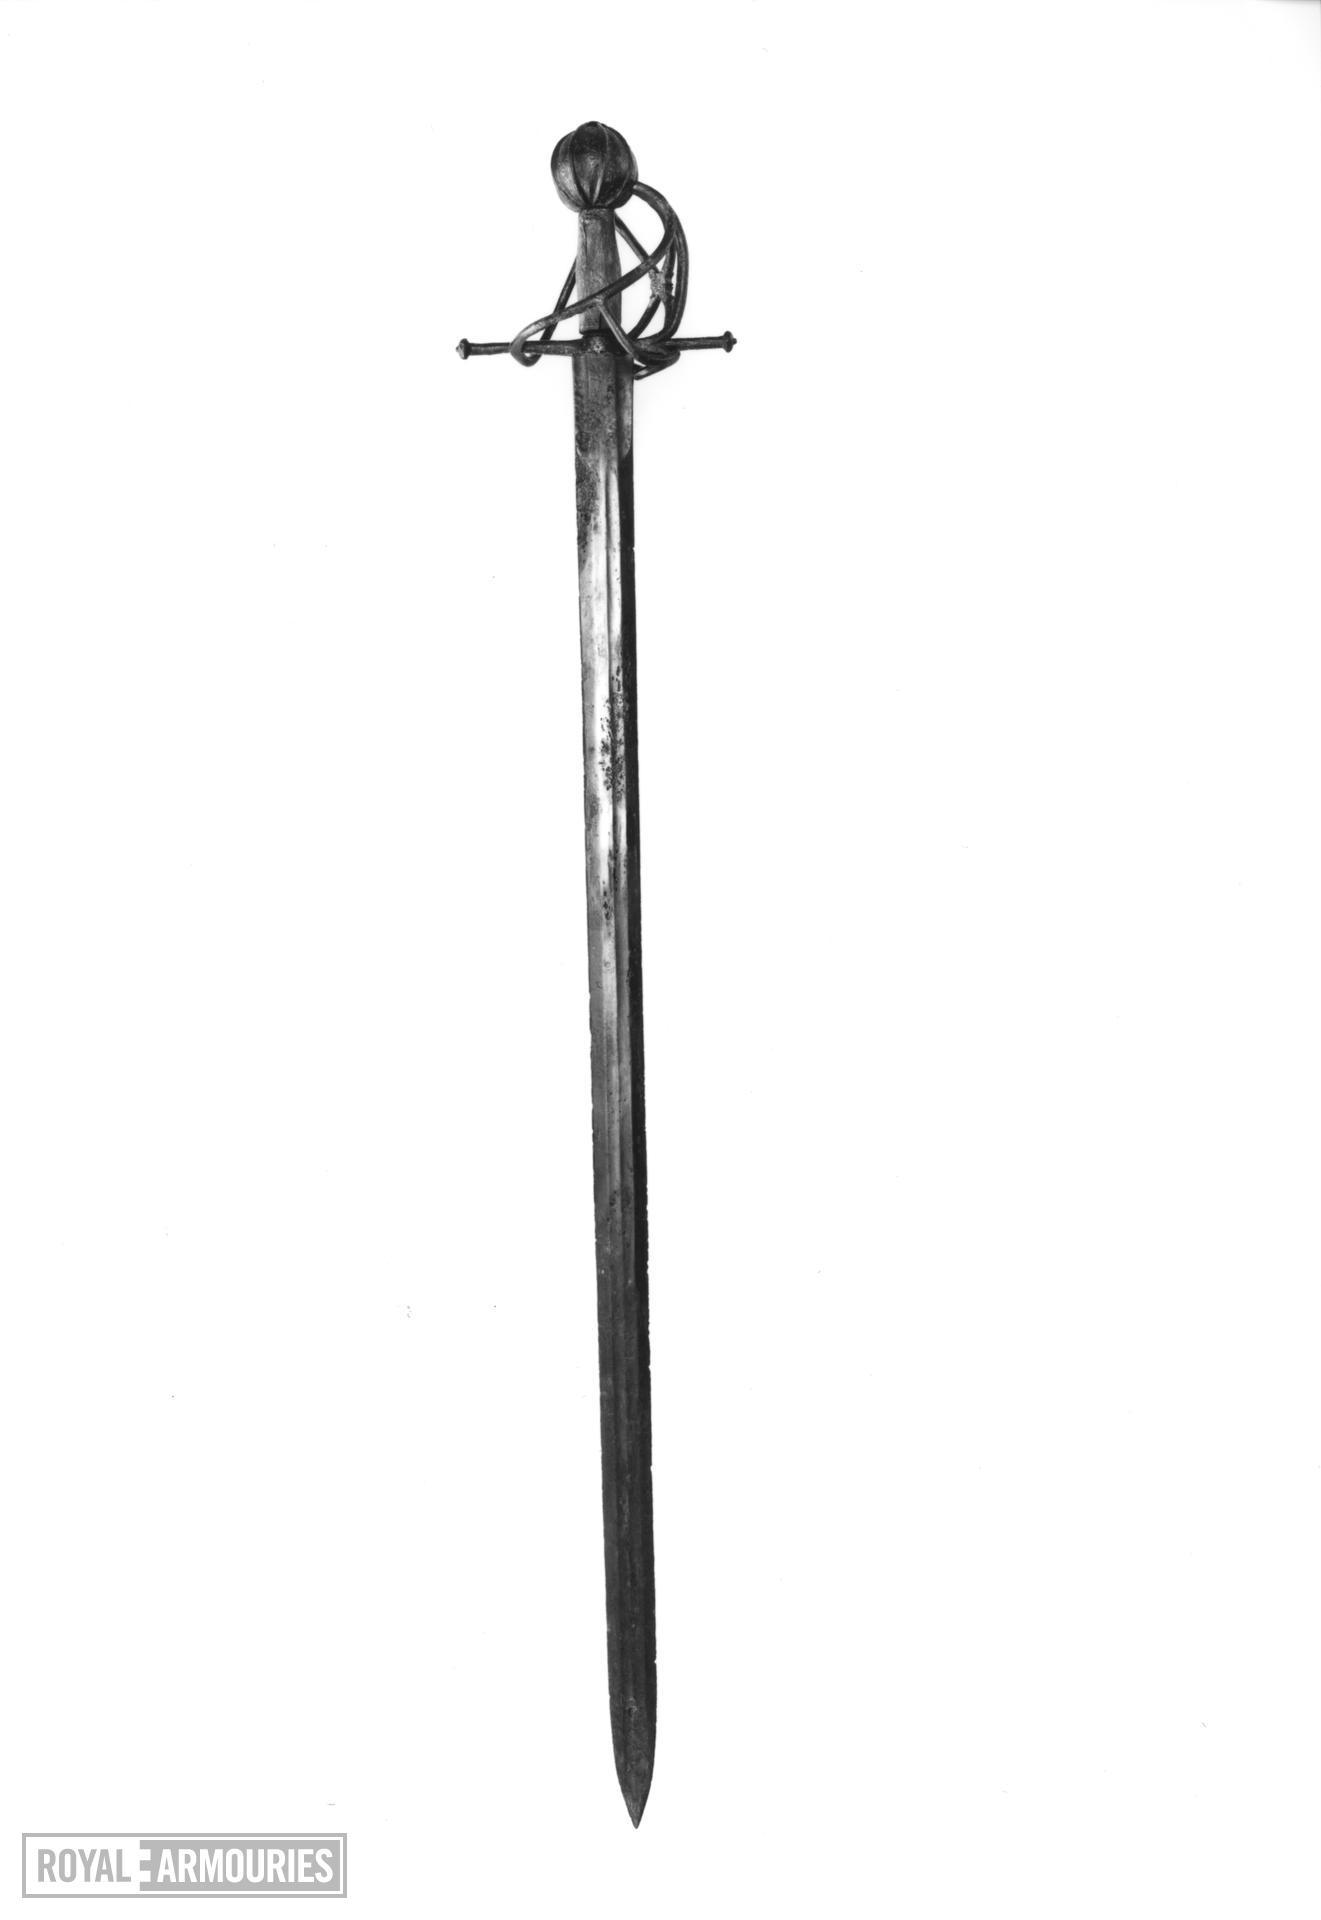 Sword - Basket hilted sword Flattened oval-sectioned wooden grip.